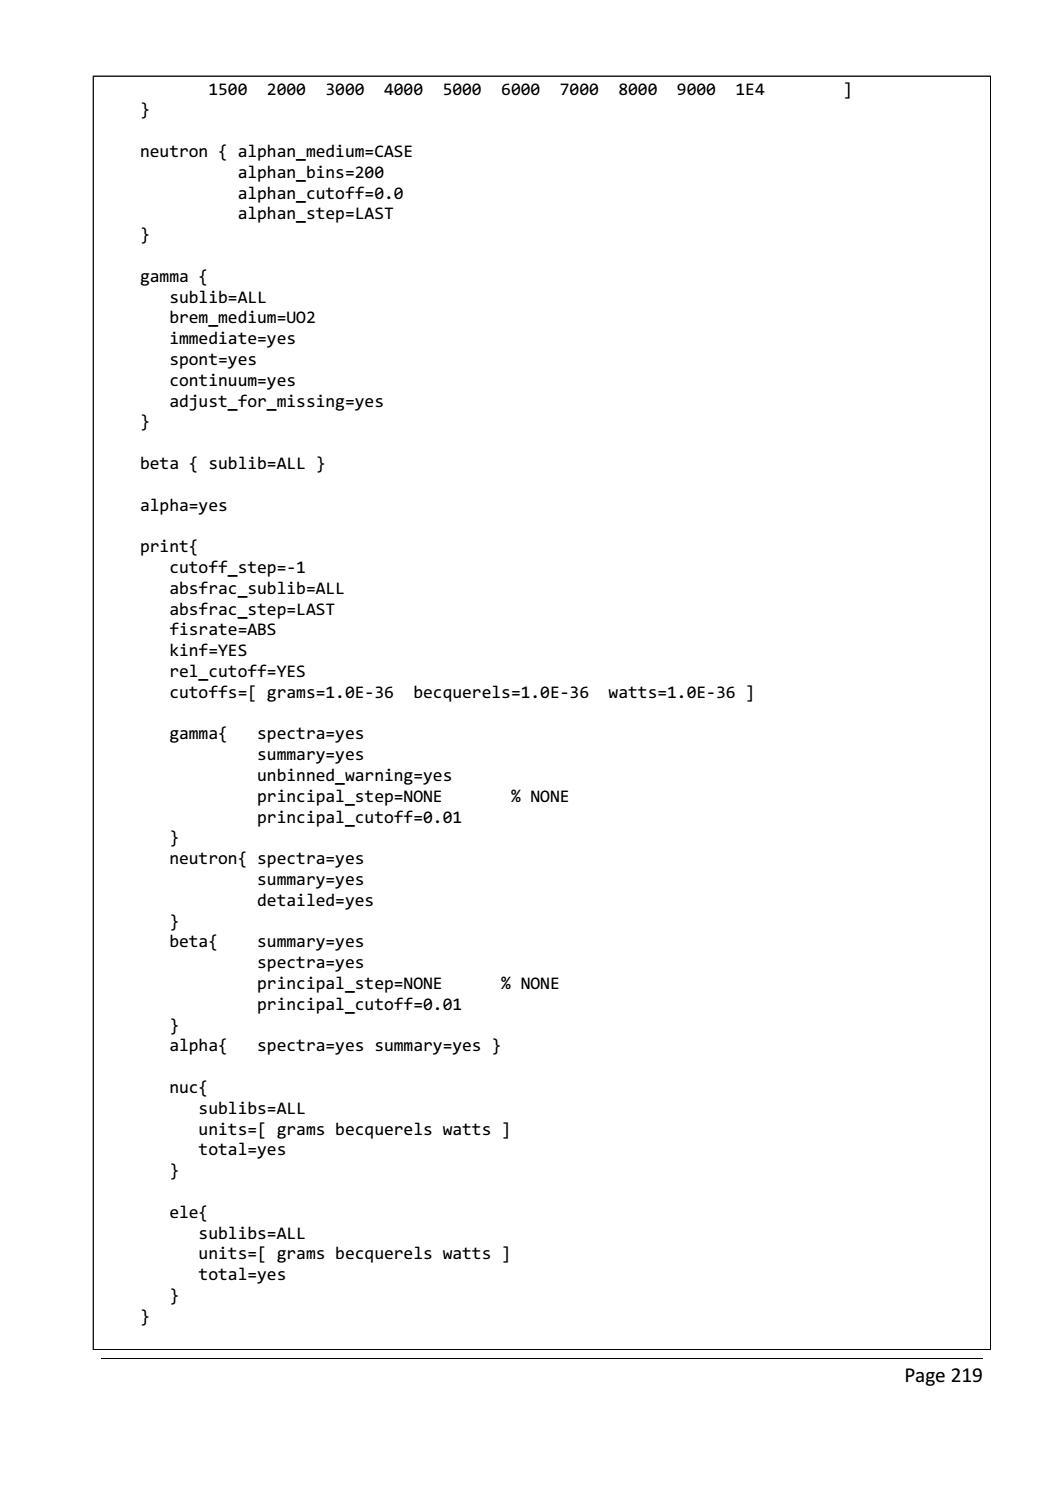 RADIOACTIVE WASTE: COMPUTATIONAL CHARACTERISATION and SHIELDING page 244